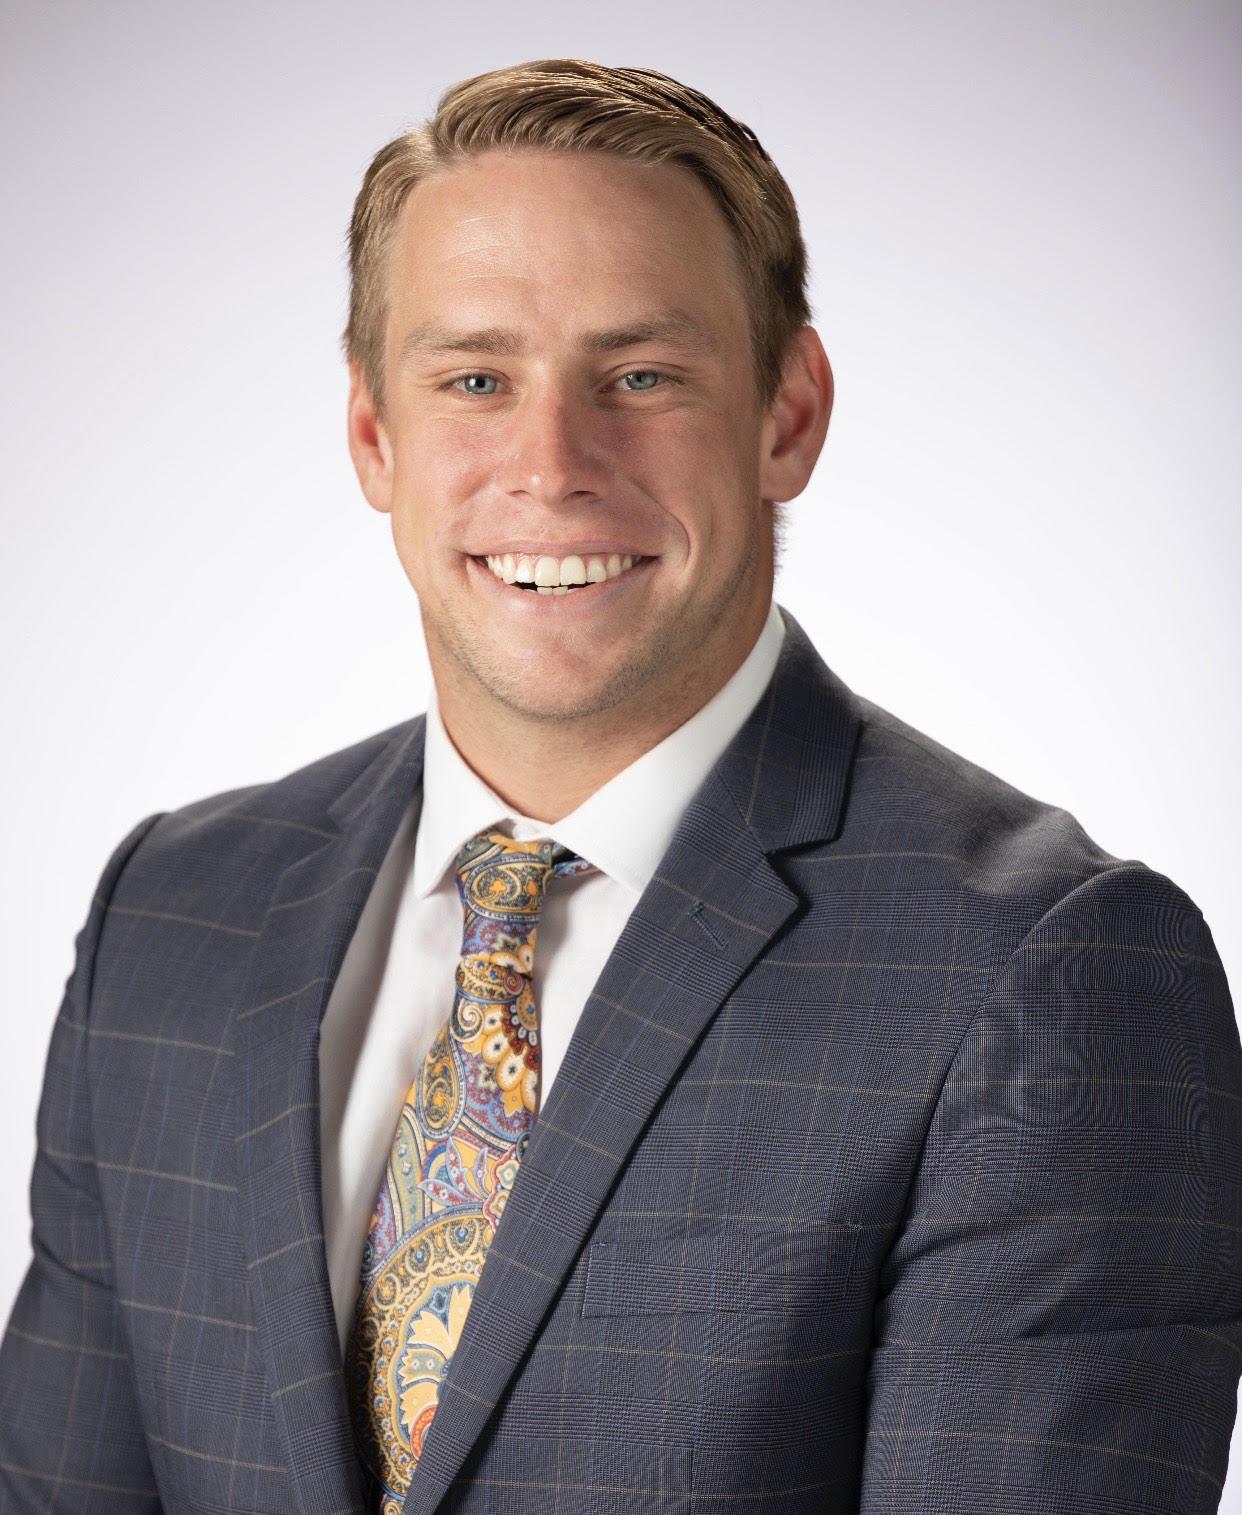 Matthew McCaleb